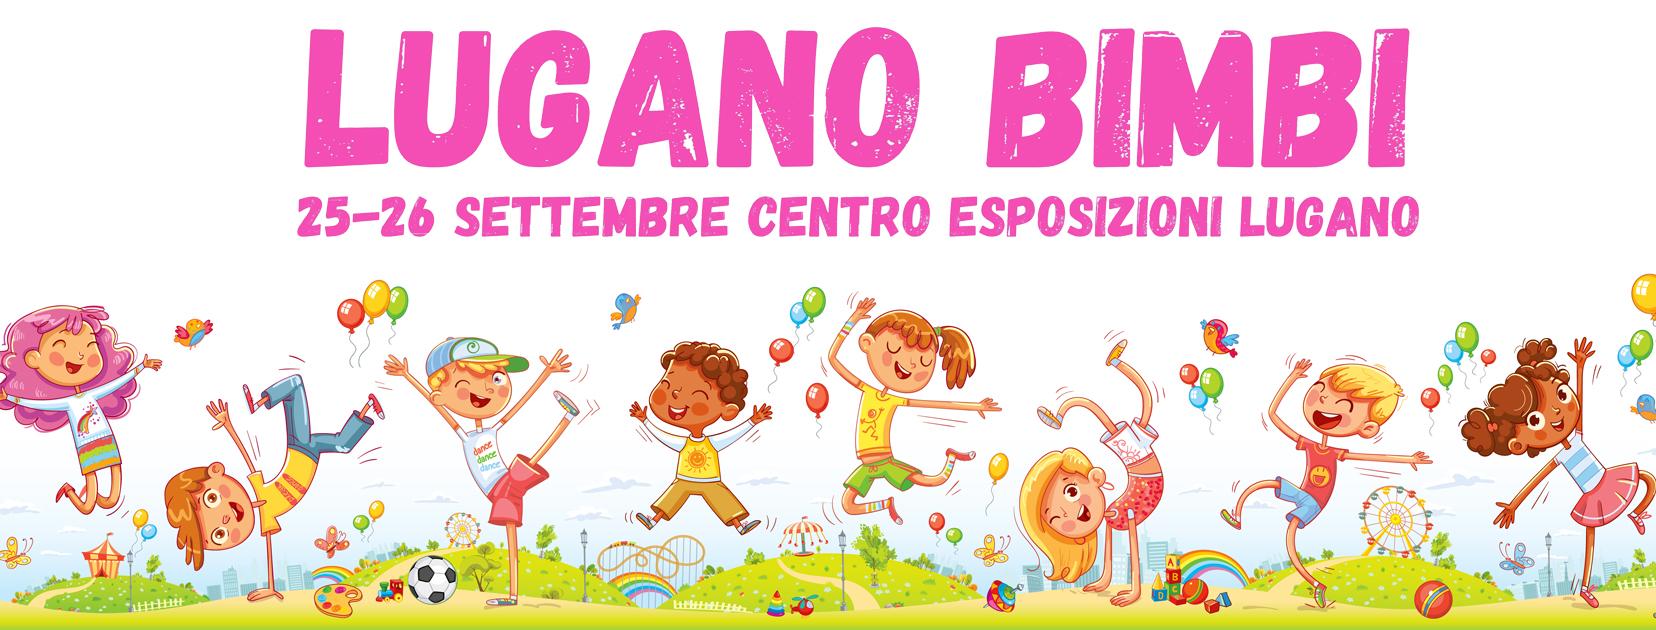 Lugano Bimbi